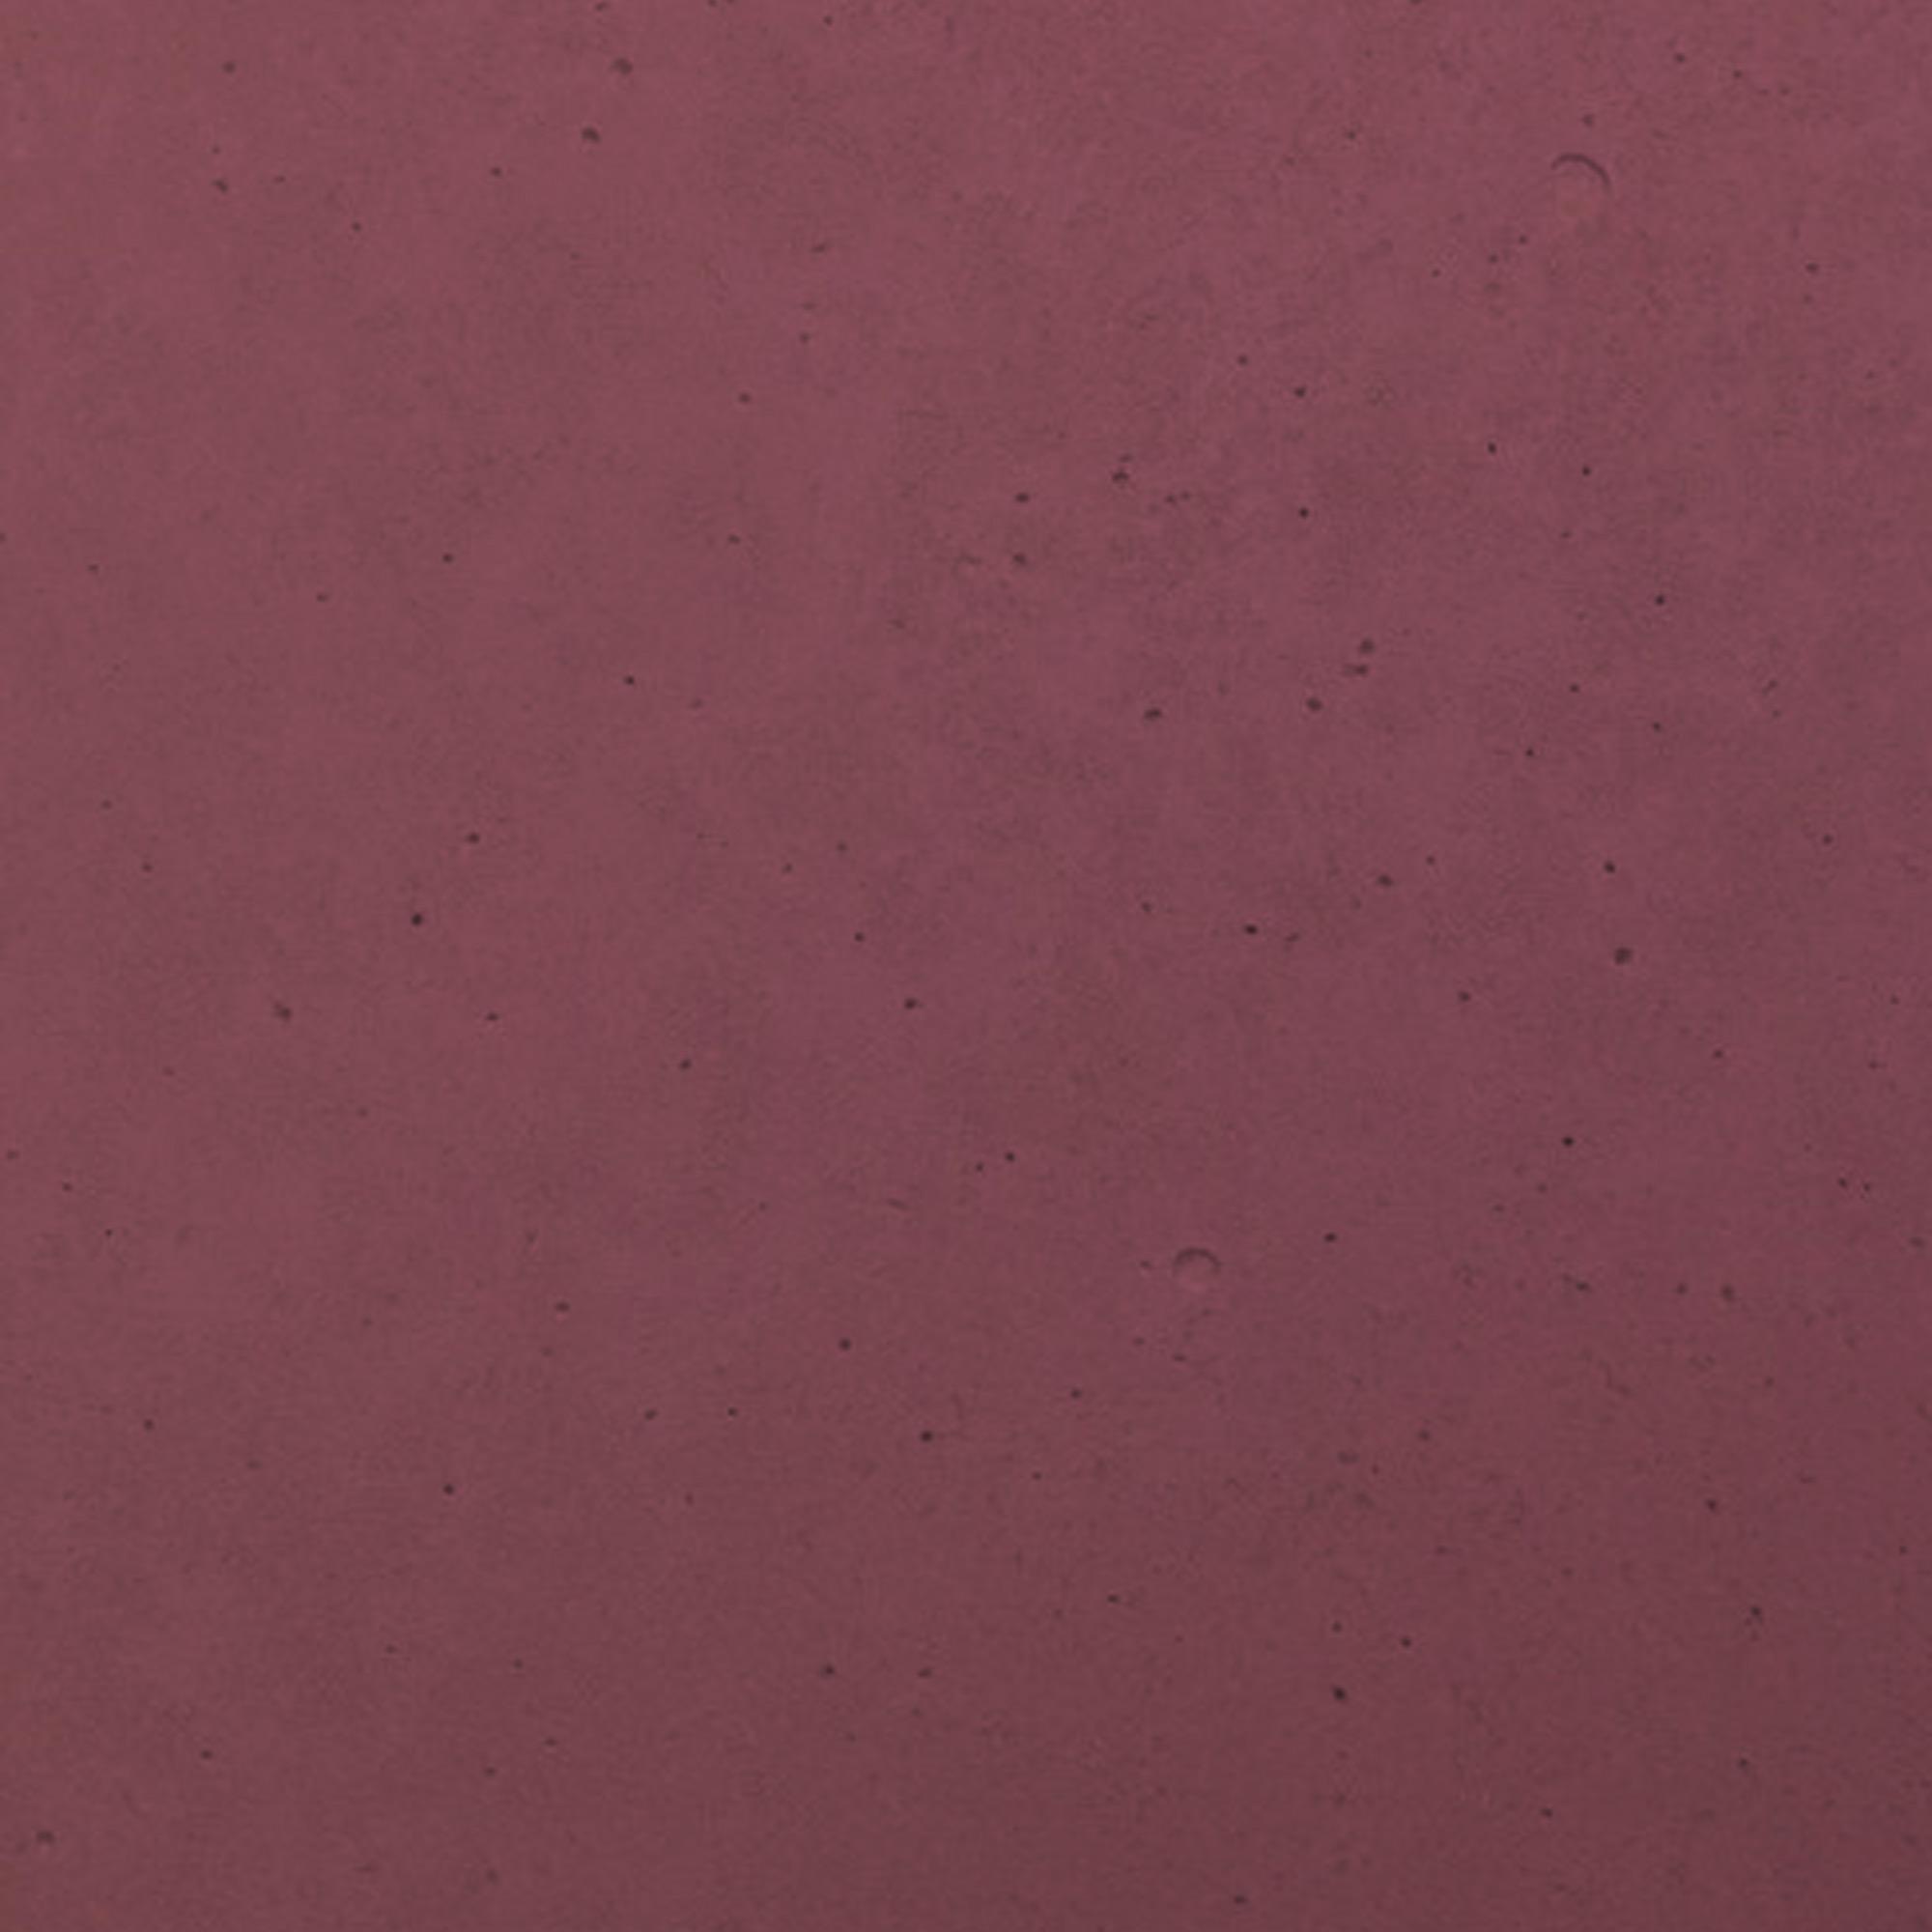 carousel-conclad-finiture-cipria-1.jpg